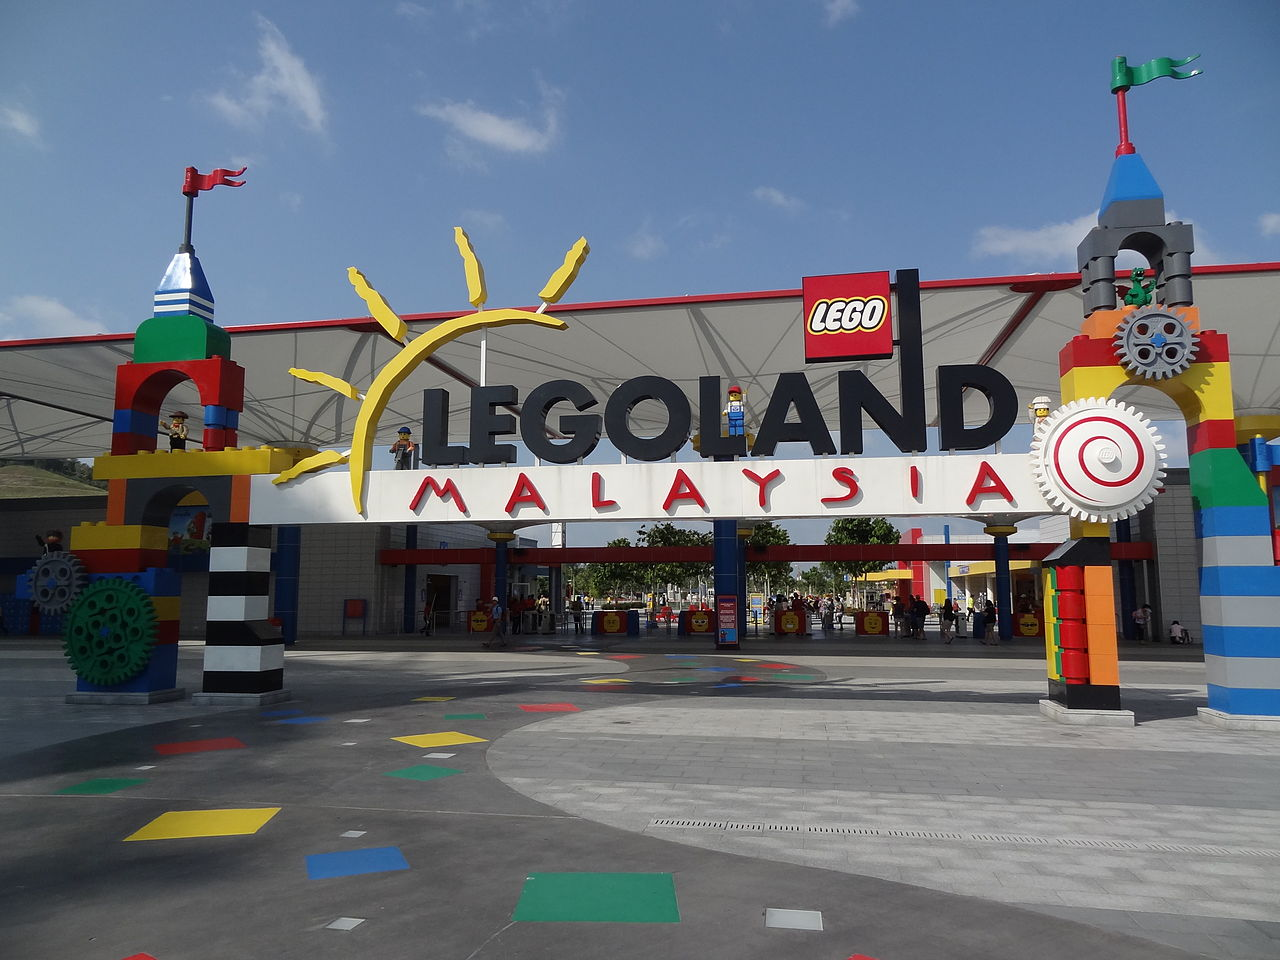 Fichier:Entrance Legoland Malaysia.jpg — Wikipédia